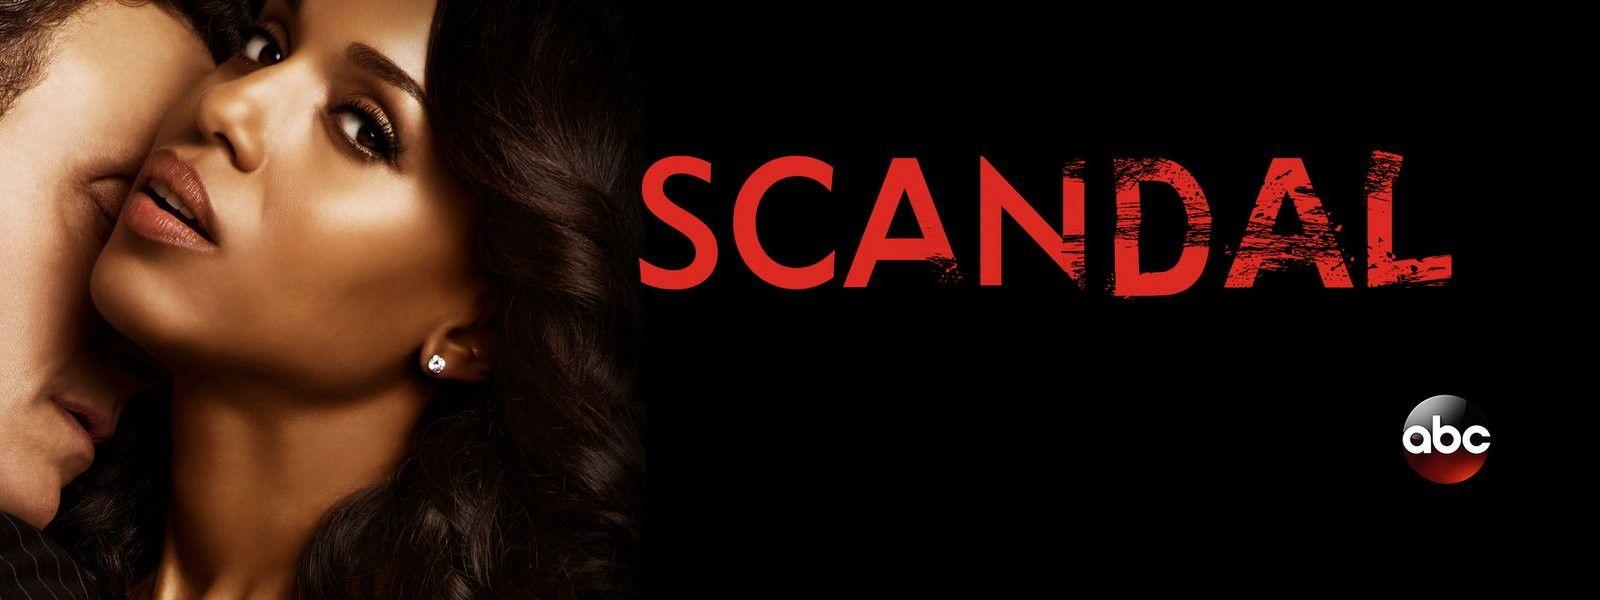 Pin by tvseriesonline on tvseriesonline | Scandal, Seasons